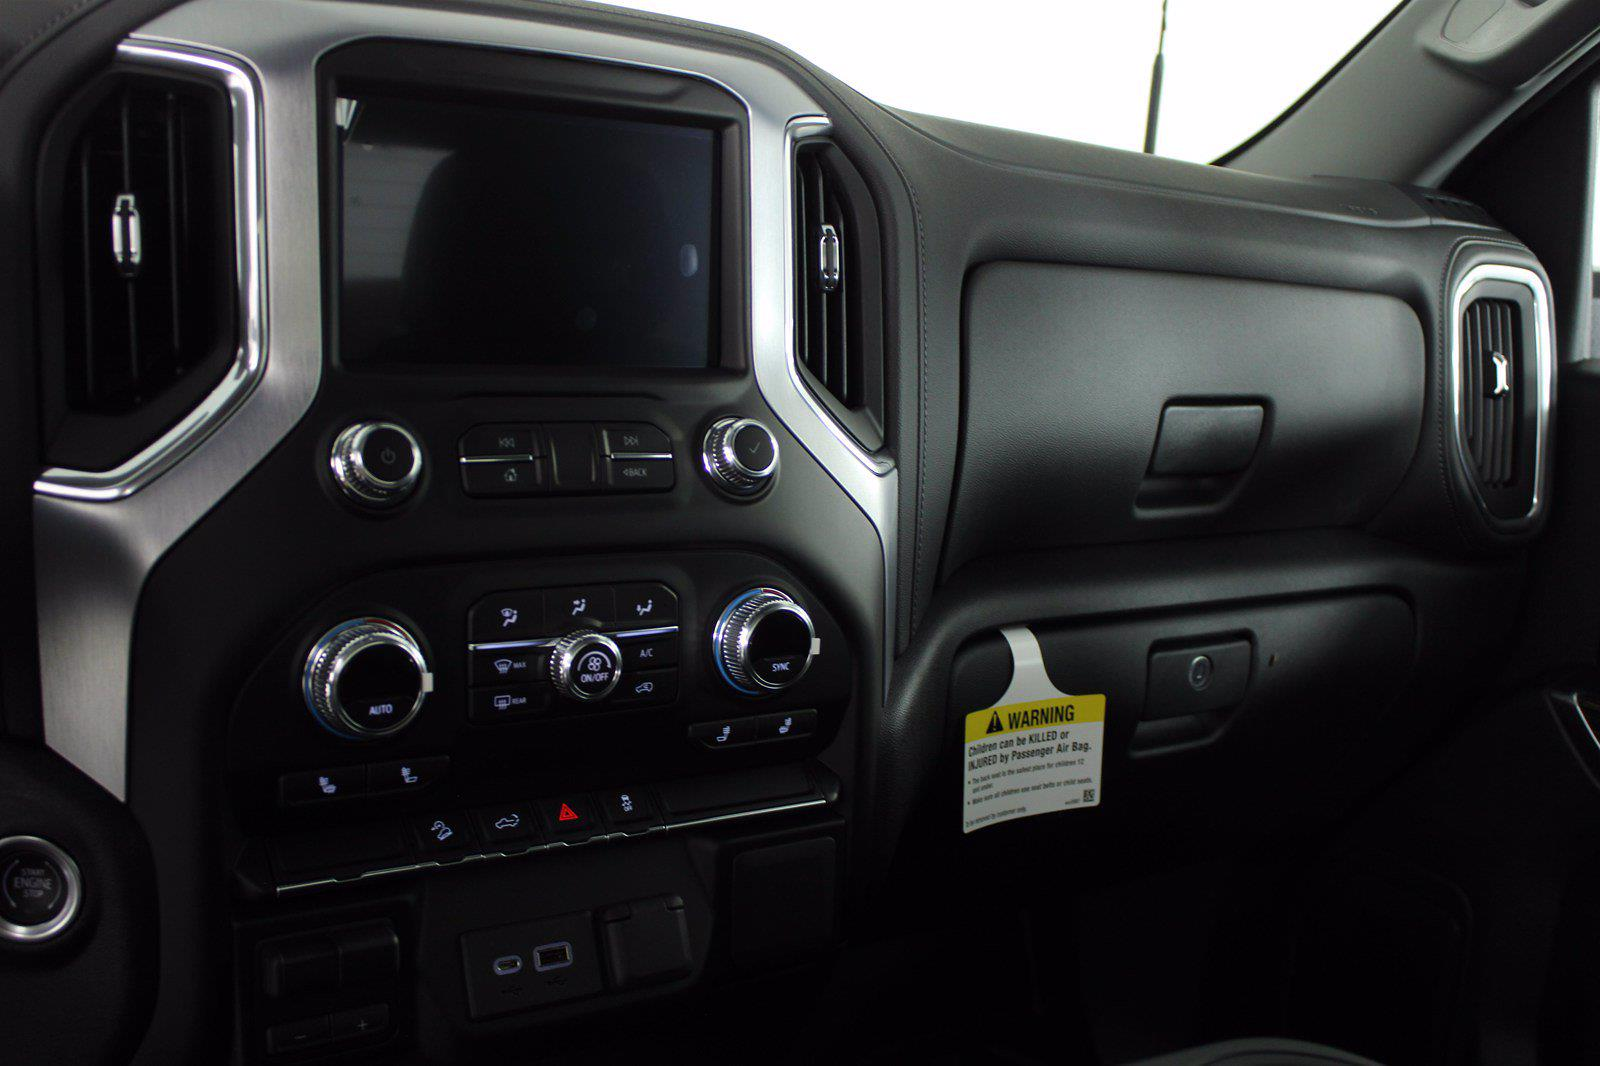 2022 Sierra 2500 Regular Cab 4x4,  Pickup #D420036 - photo 12